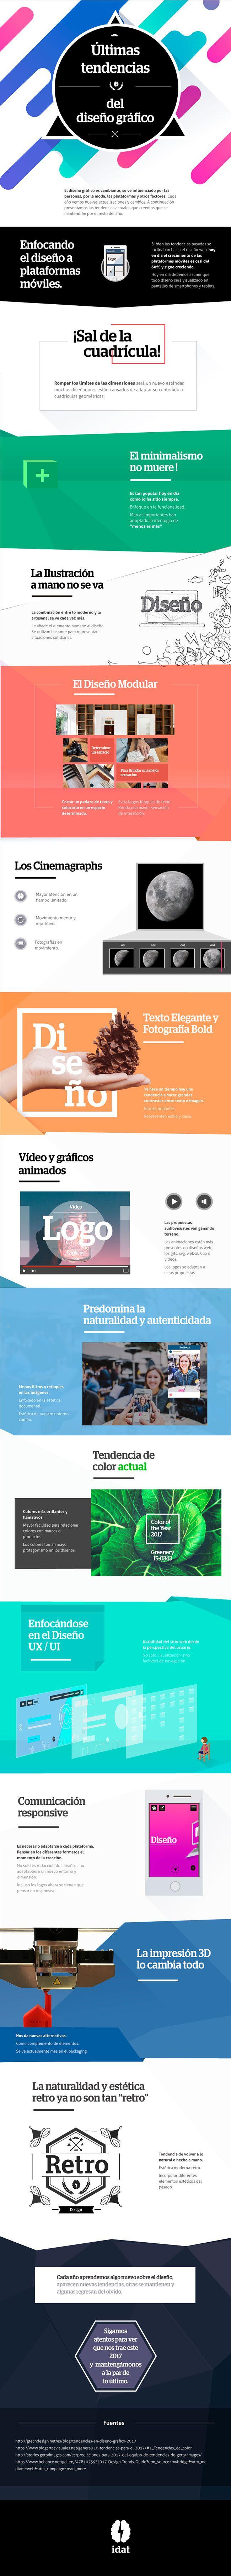 Tendencias del diseño gráfico https://www.a2hosting.com/?aid=jrstudioweb&bid=c4f6c5c0